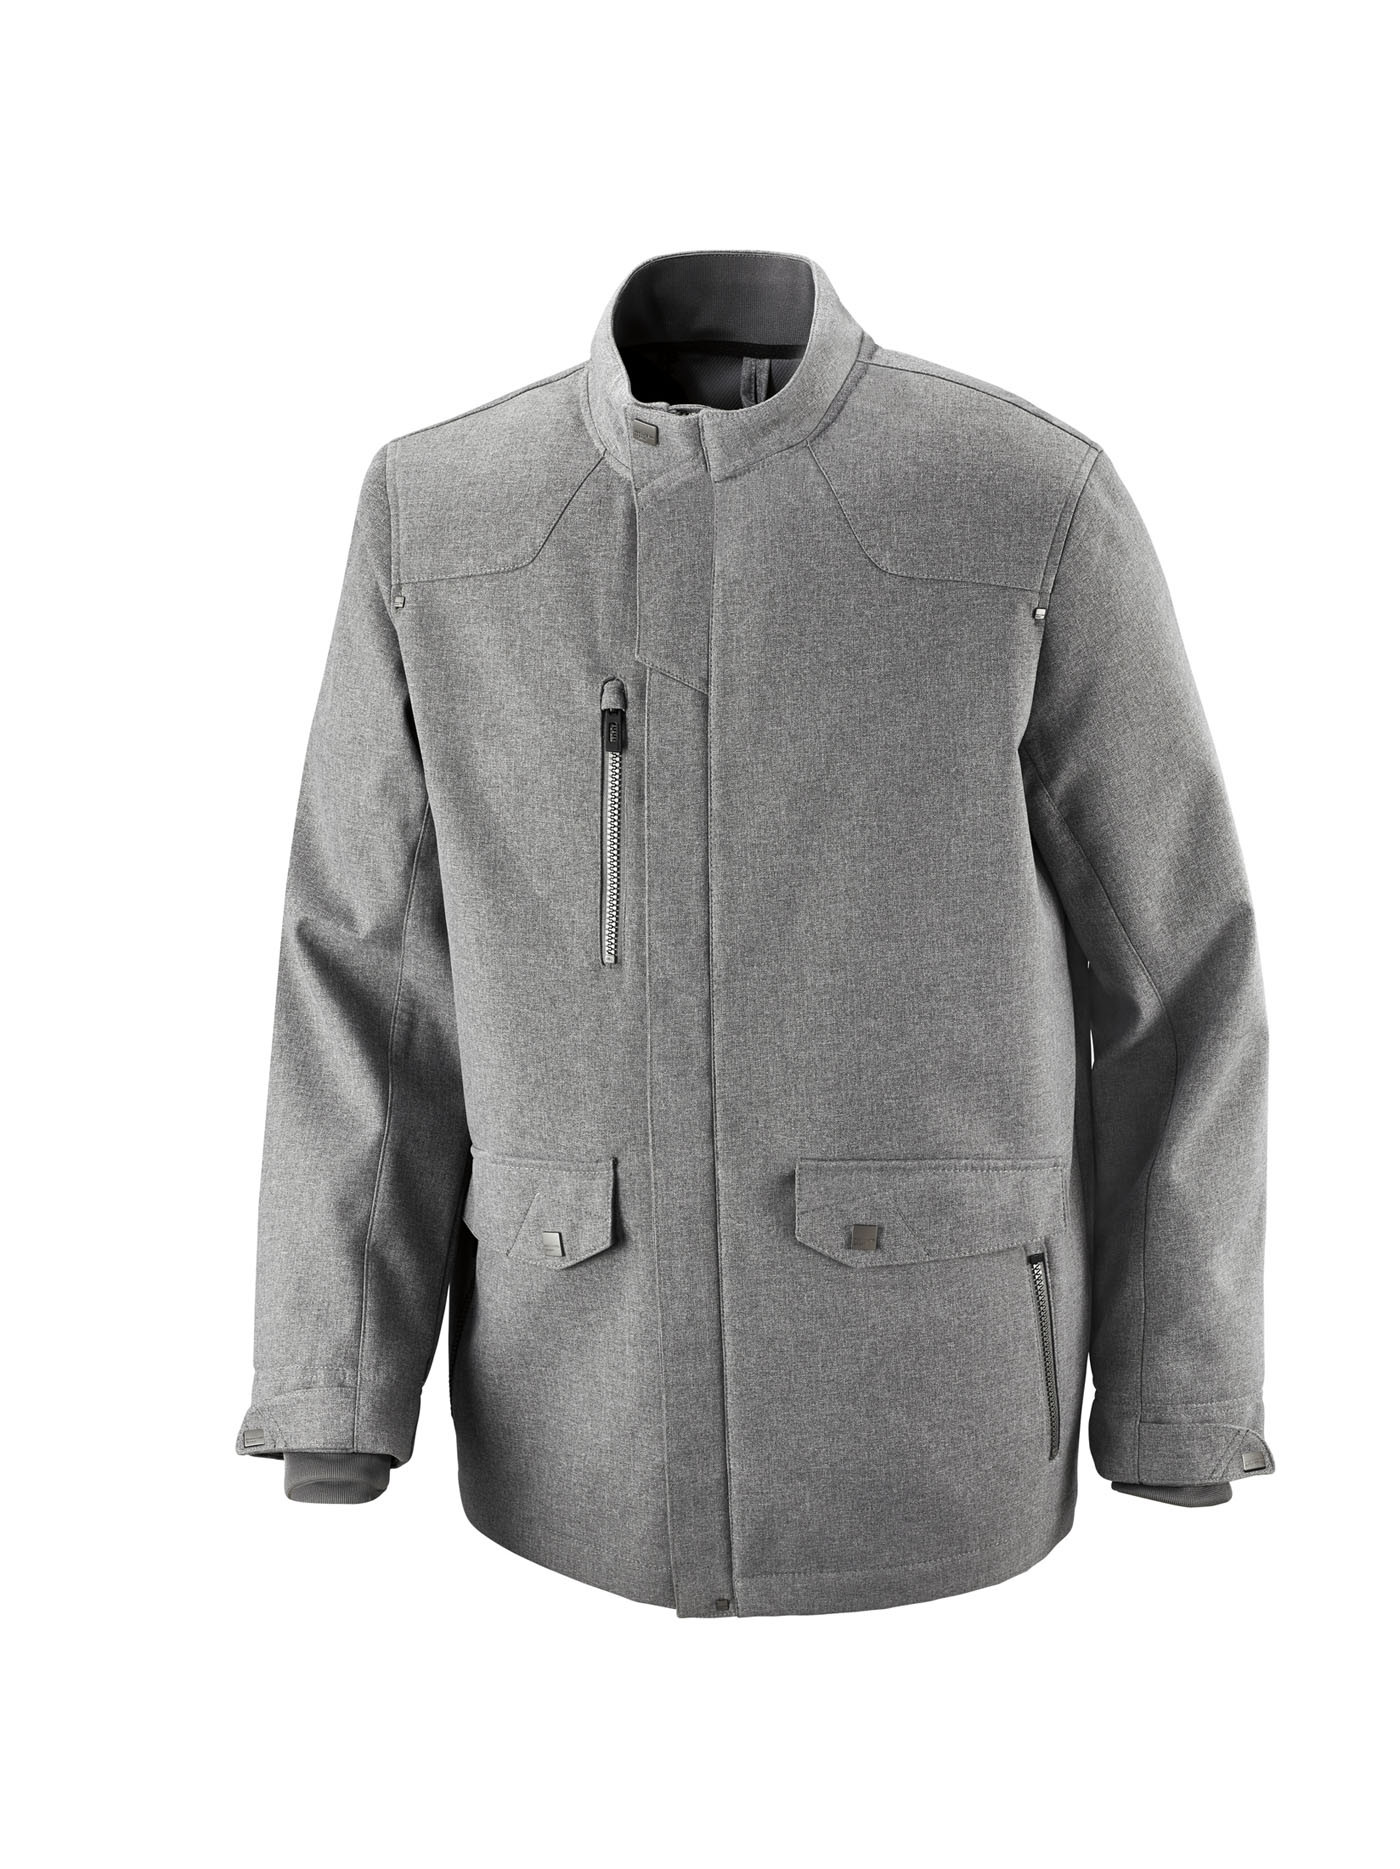 Ash City Light Bonded Jackets 88672 - Uptown Men's 3-Layer Light Bonded City Textured Soft Shell Jacket